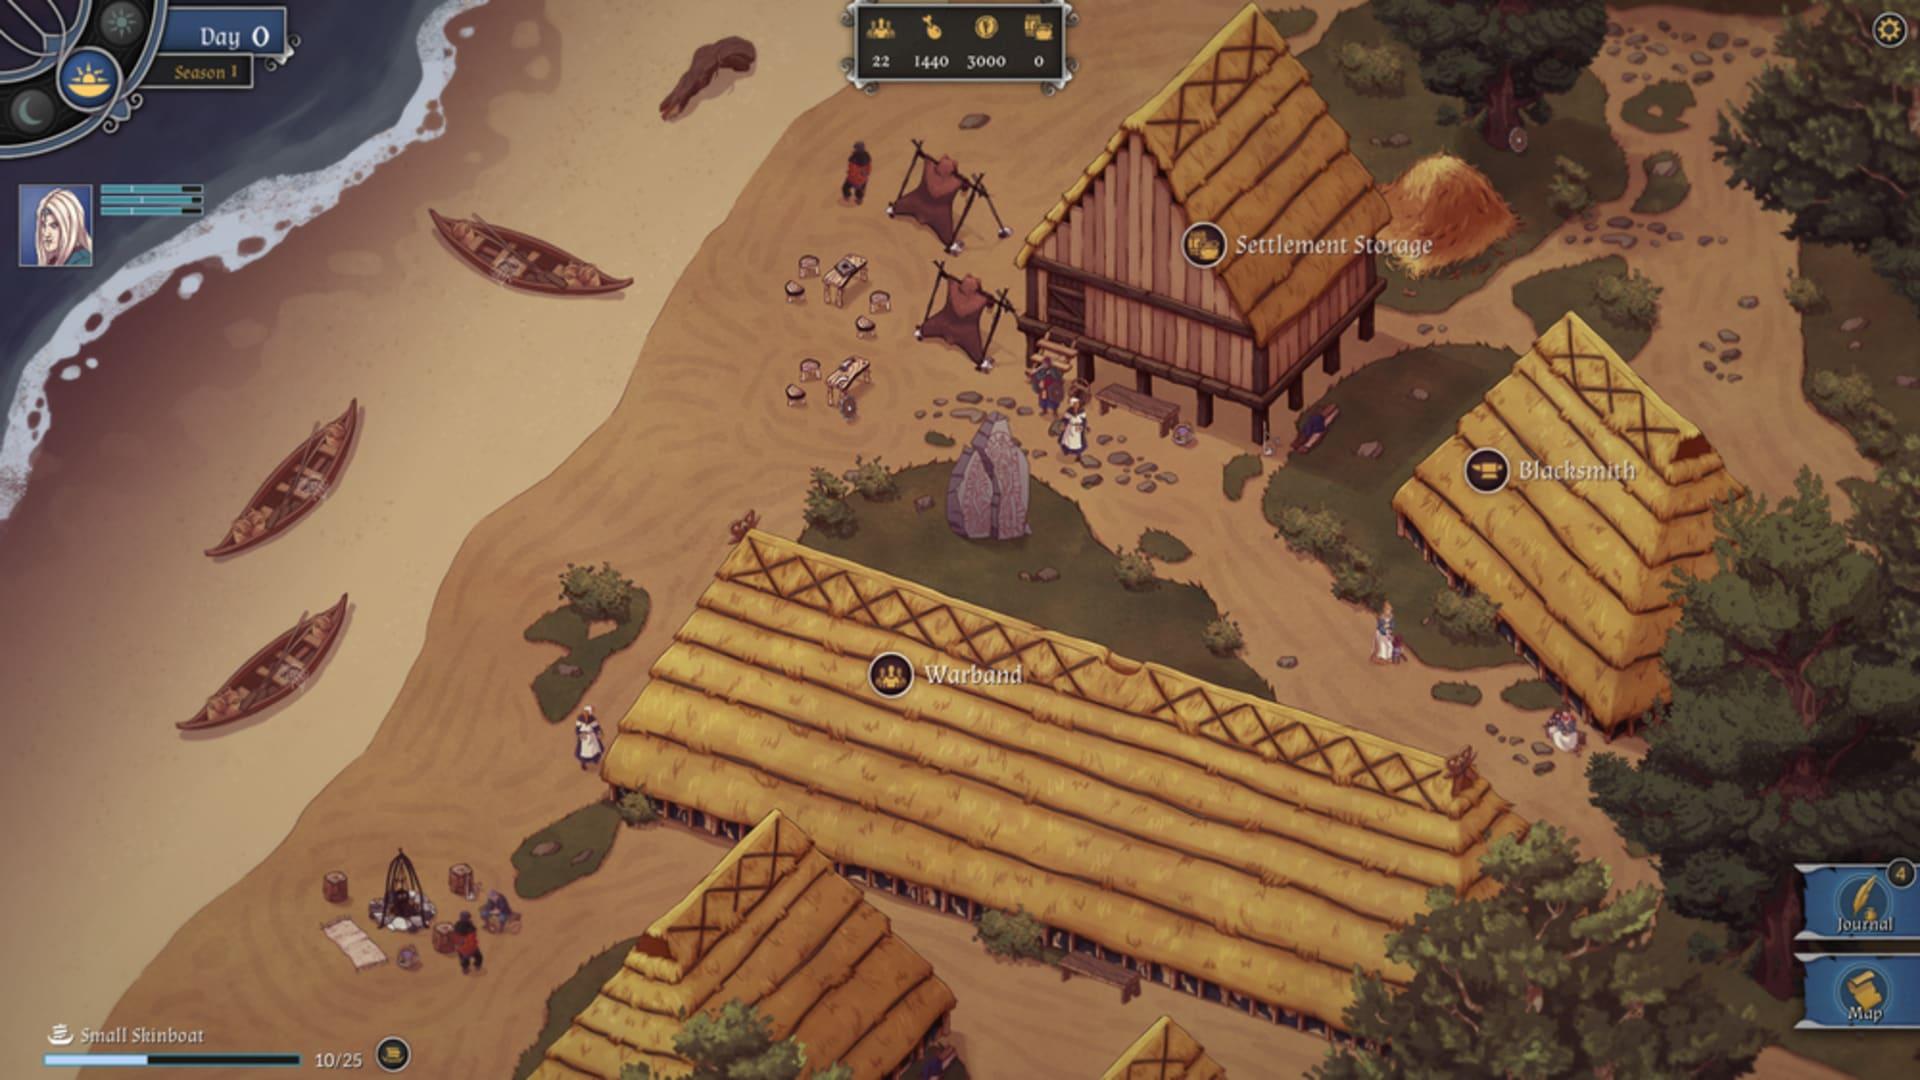 Vikingaspelet The Great Whale Road släpps snart